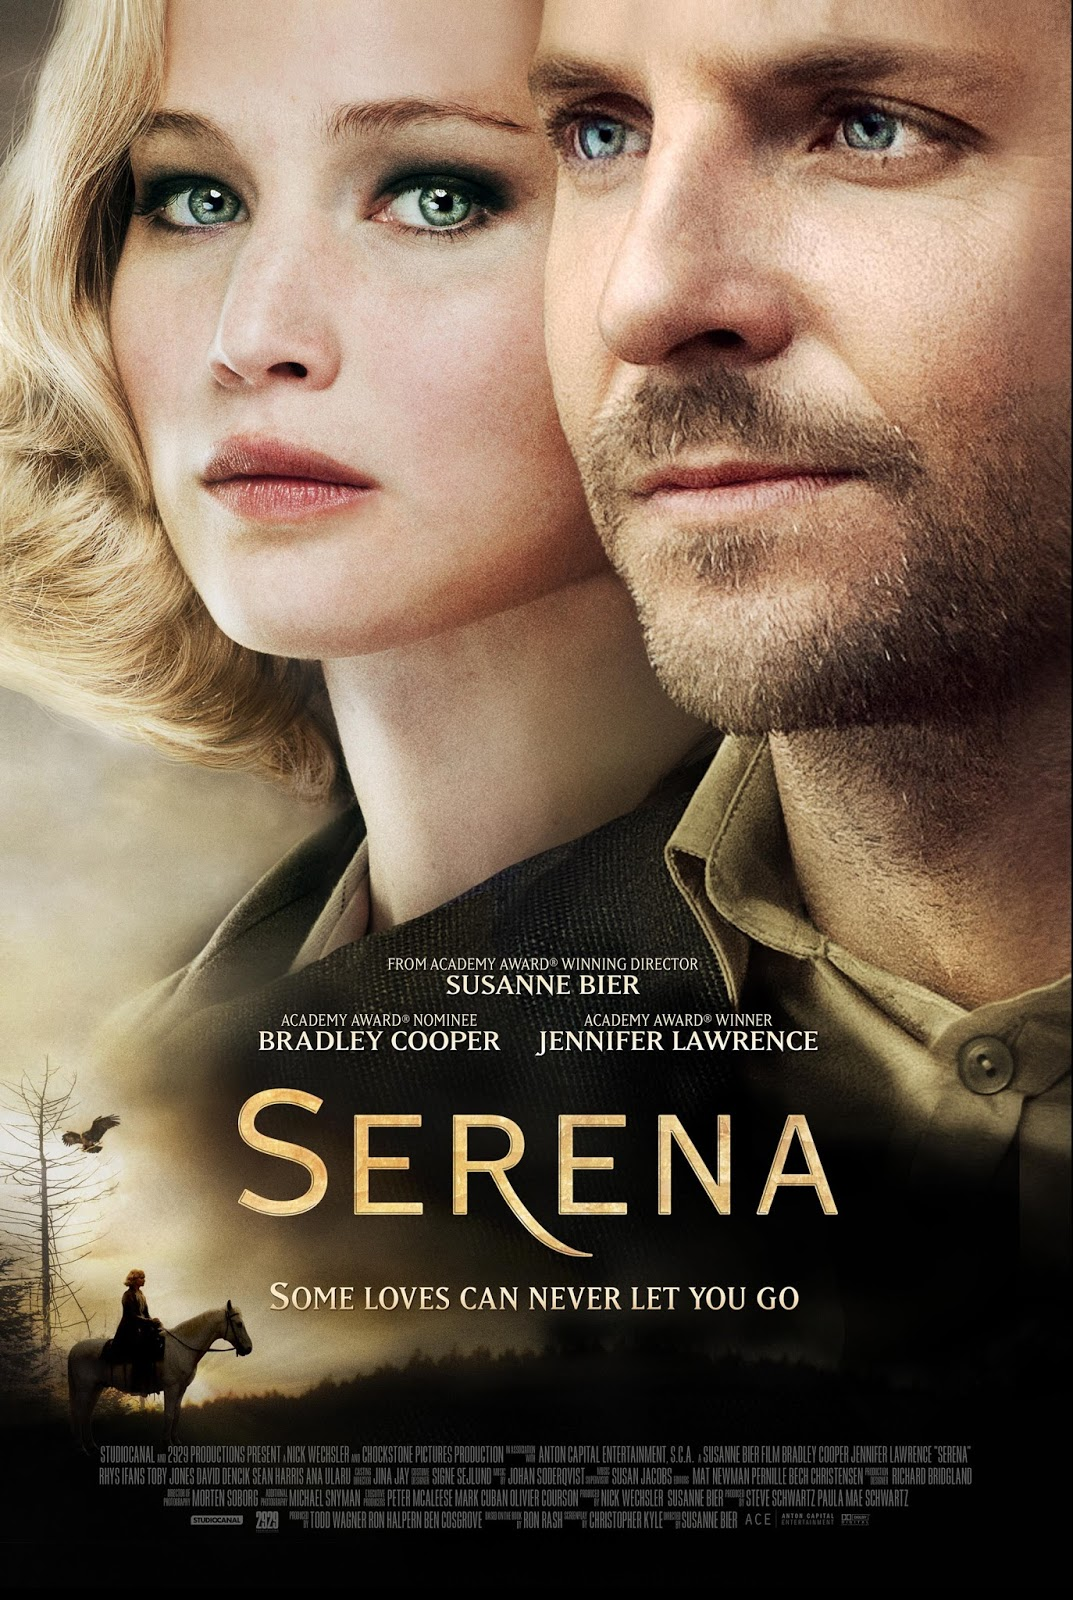 Serena Book to Movie, Bradley Cooper, Jennifer Lawrence, Susanne Bier, Ron Rash, Serena, Delicious Reads